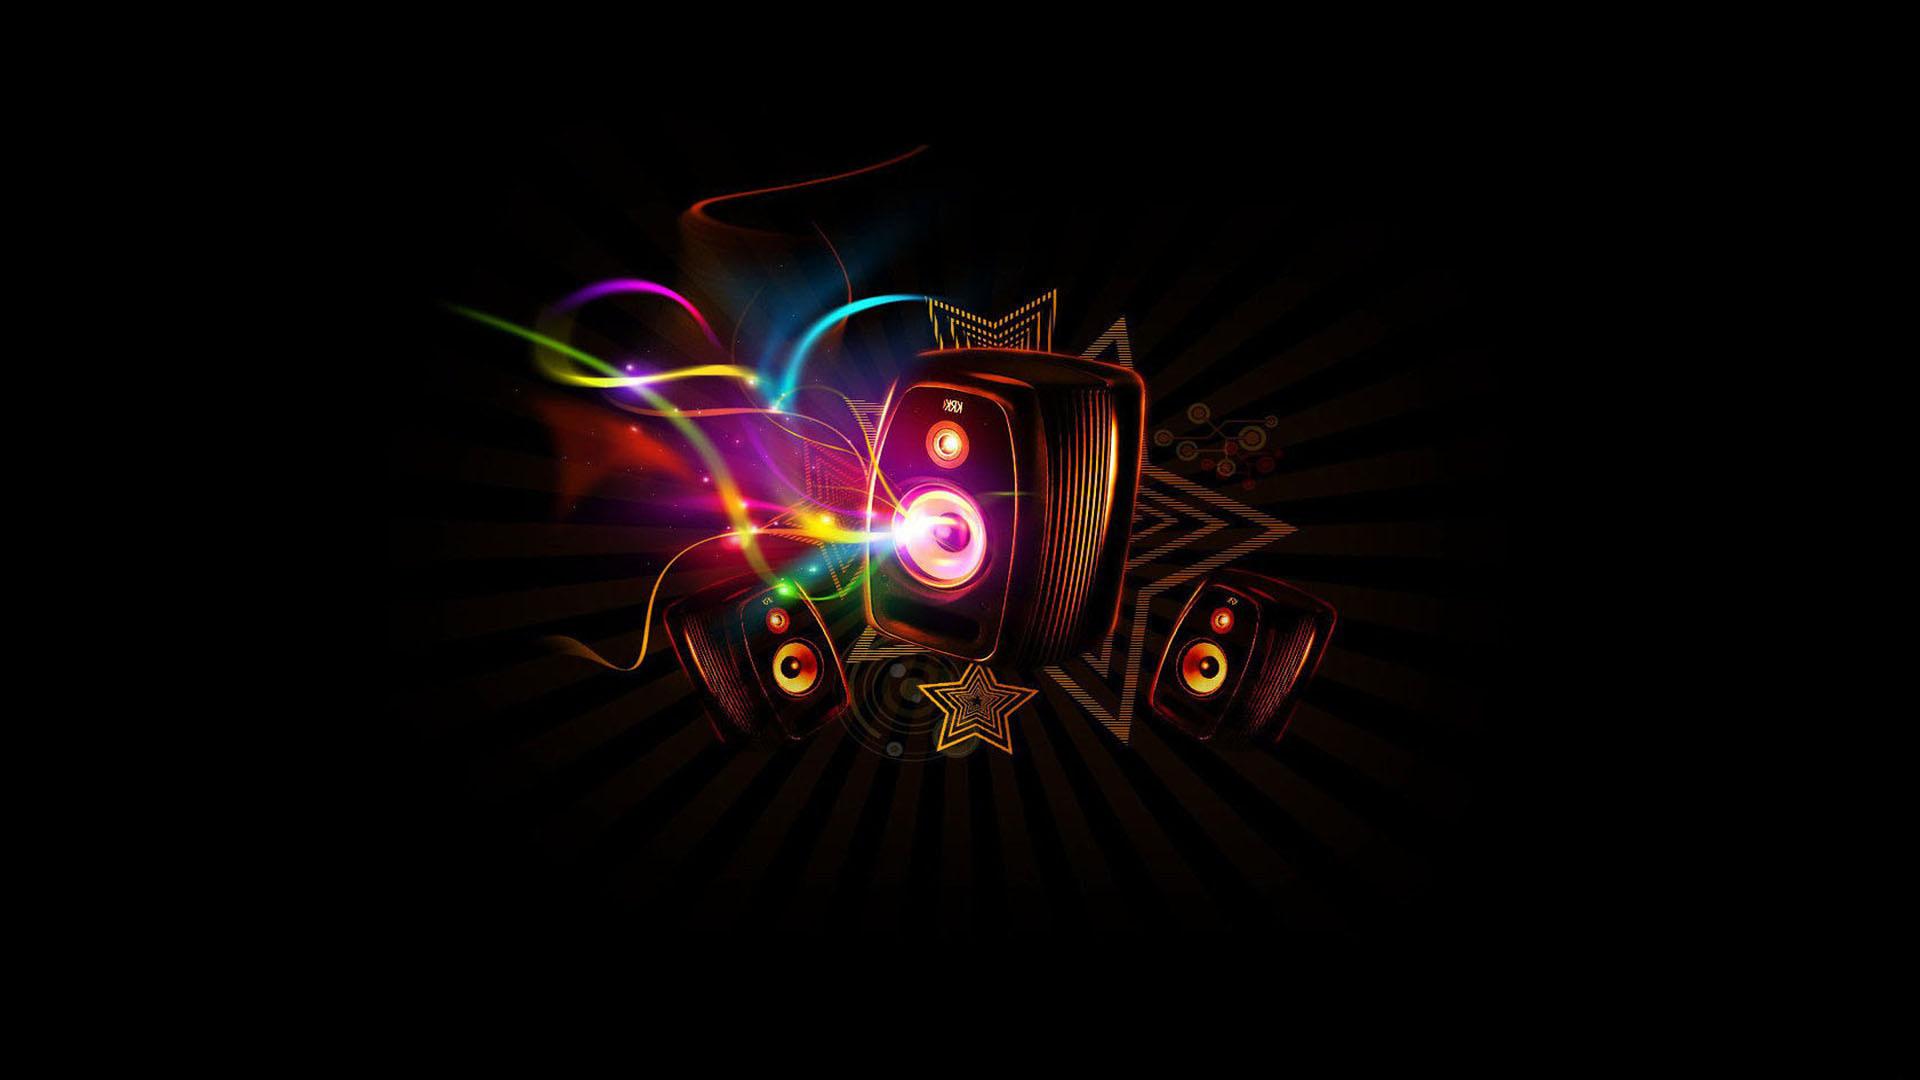 Живая музыка моя жизнь это музыка